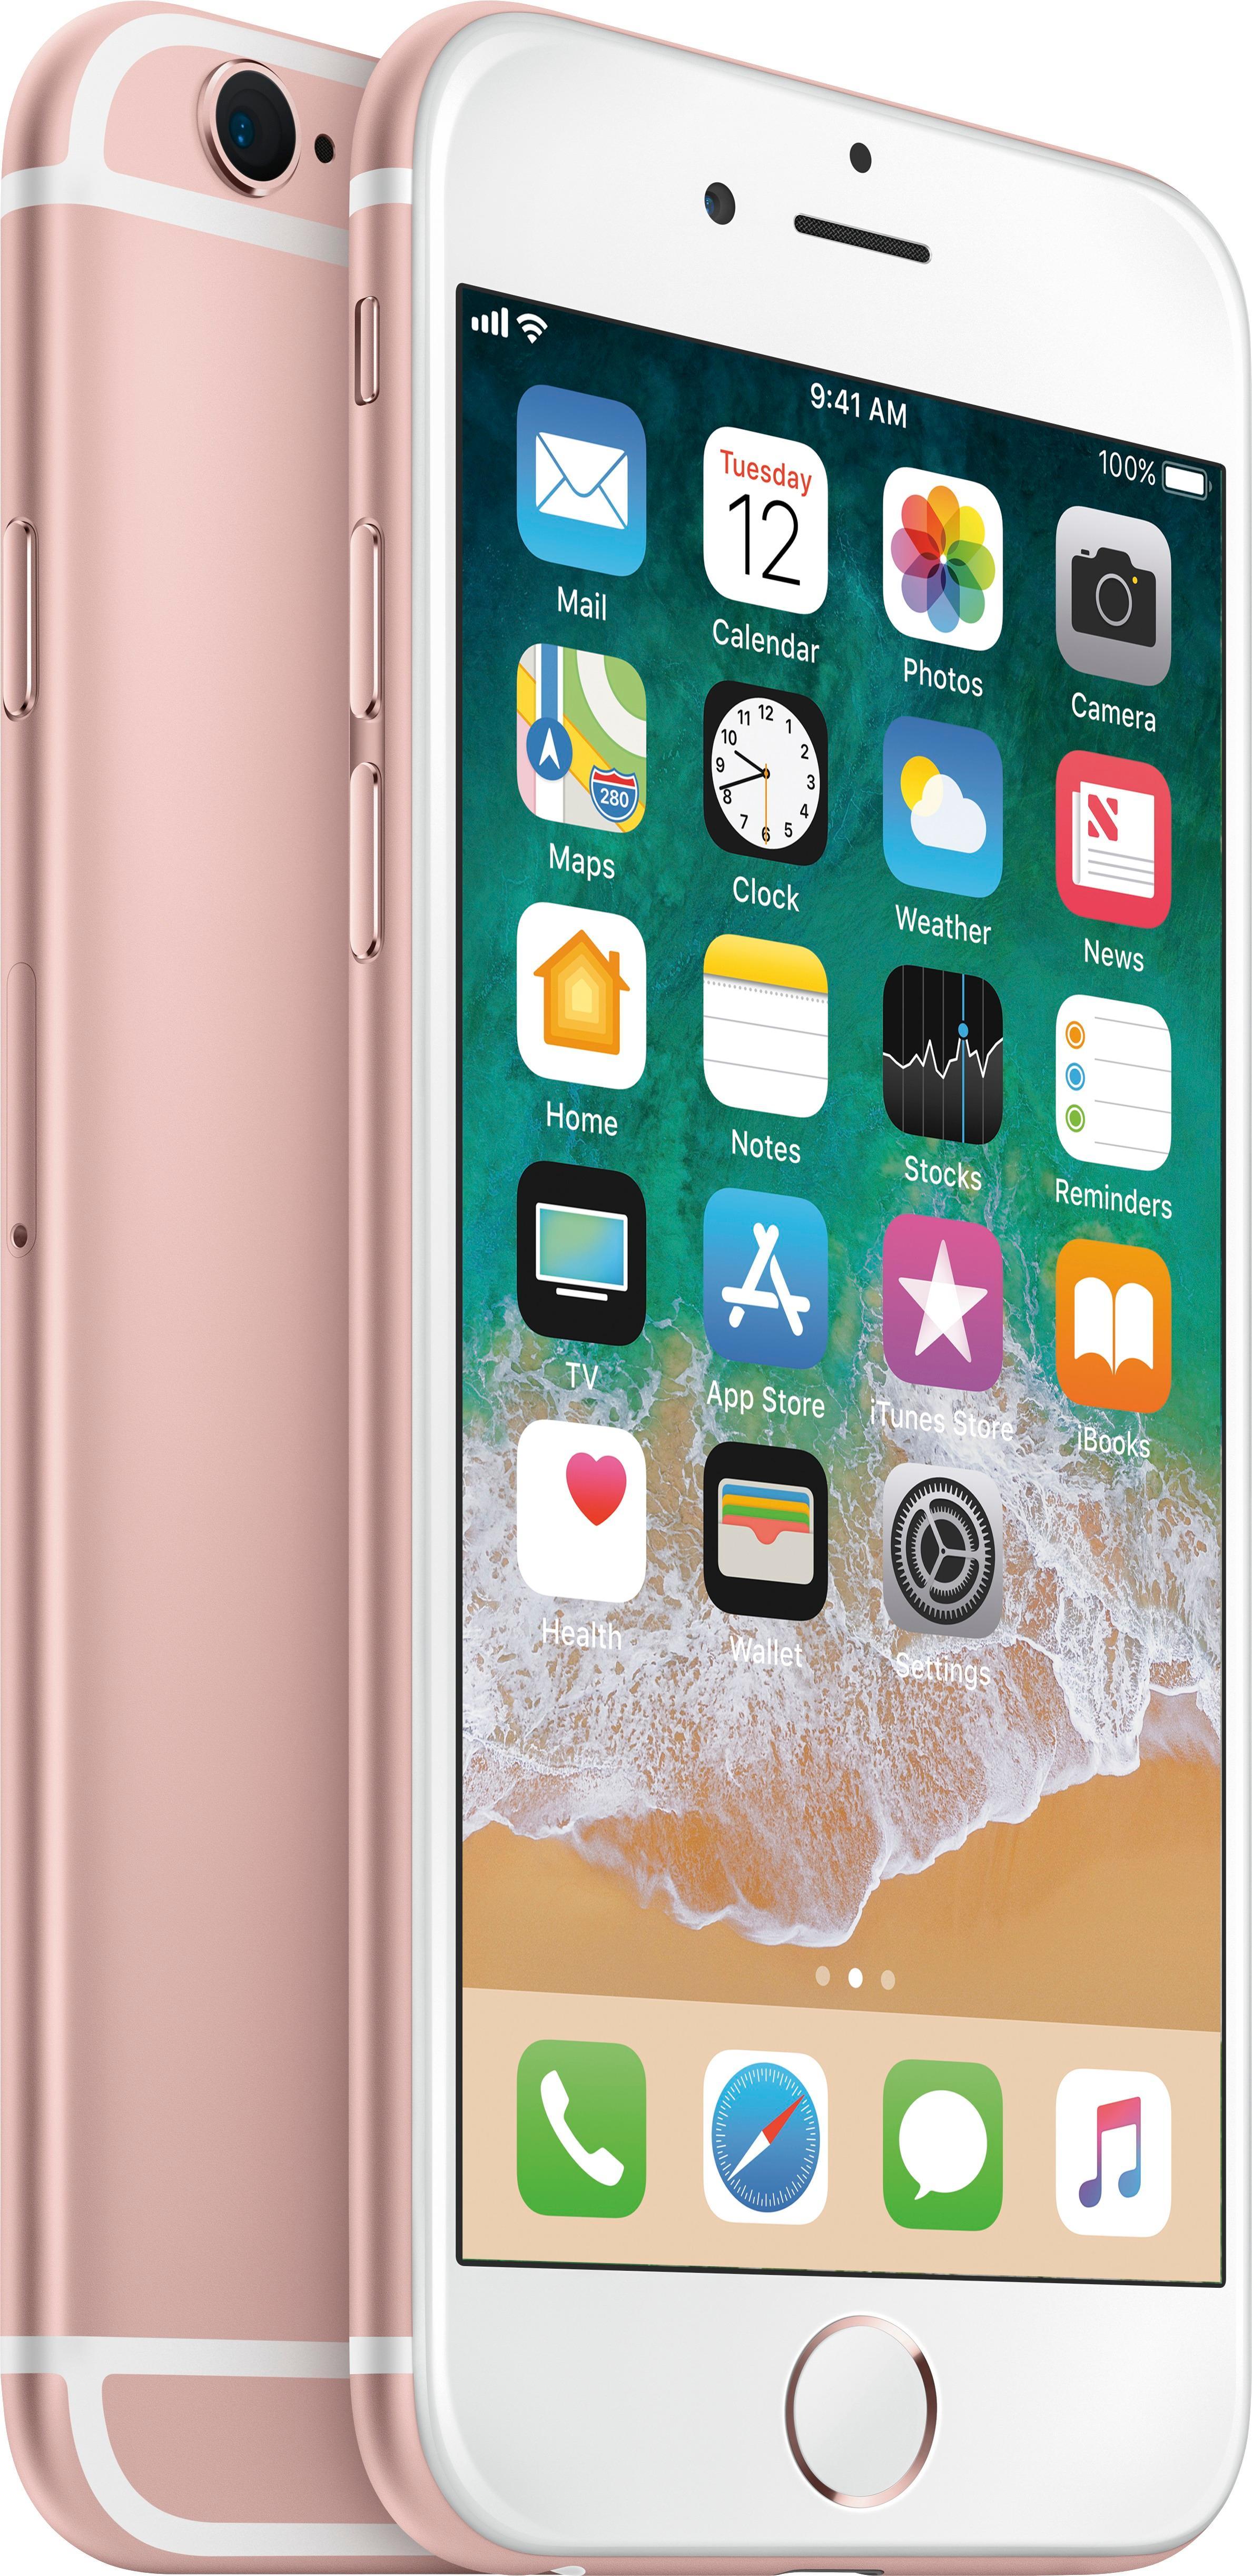 Apple RECVM6S16ROS angleImage